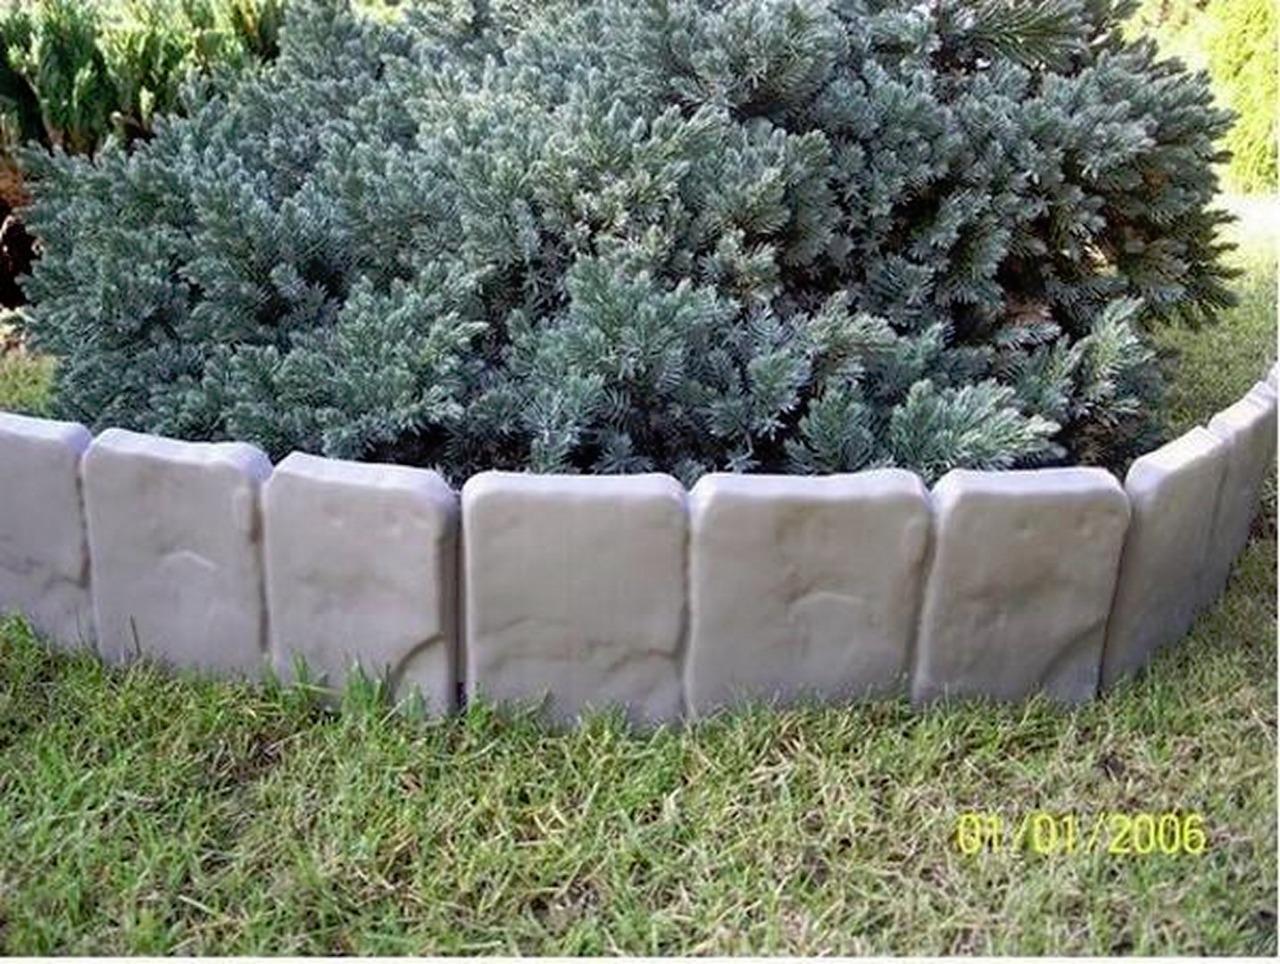 Plastic Garden Fence Panels Boarder Lawn Palisade Edge Patio Fencing GREY BJS